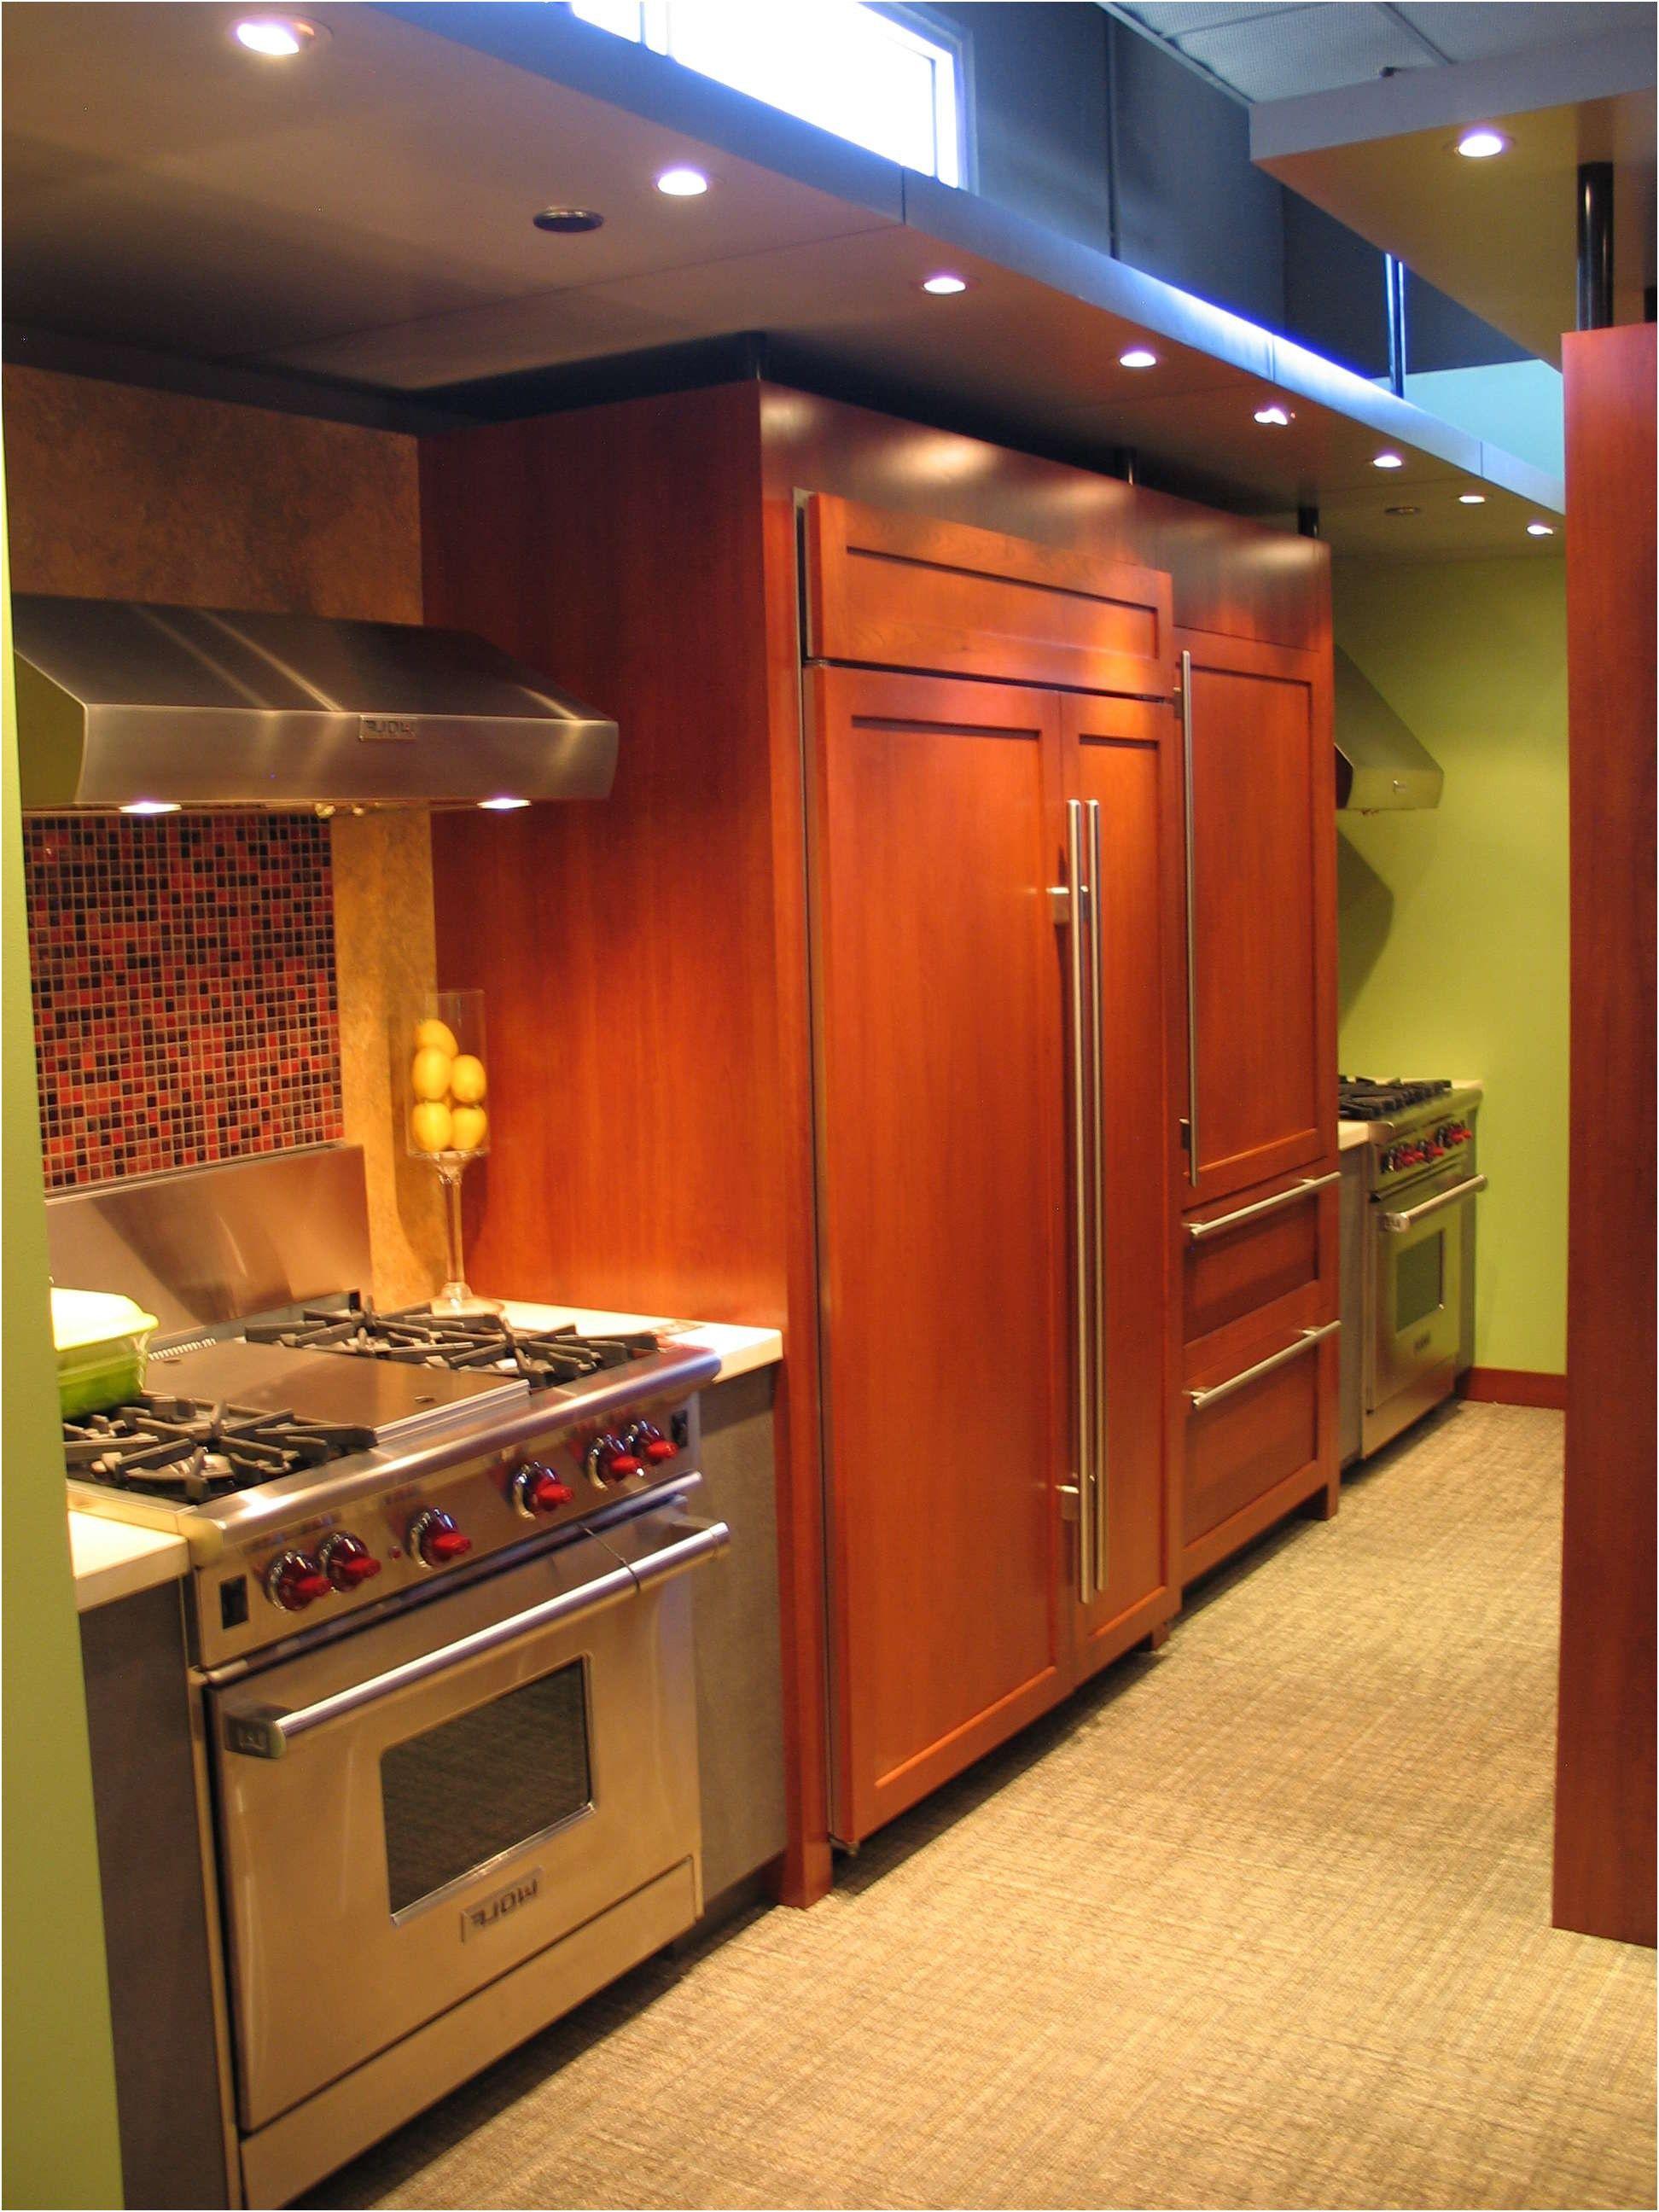 san antonio cabinet appliance store from Kitchen Appliances San ...